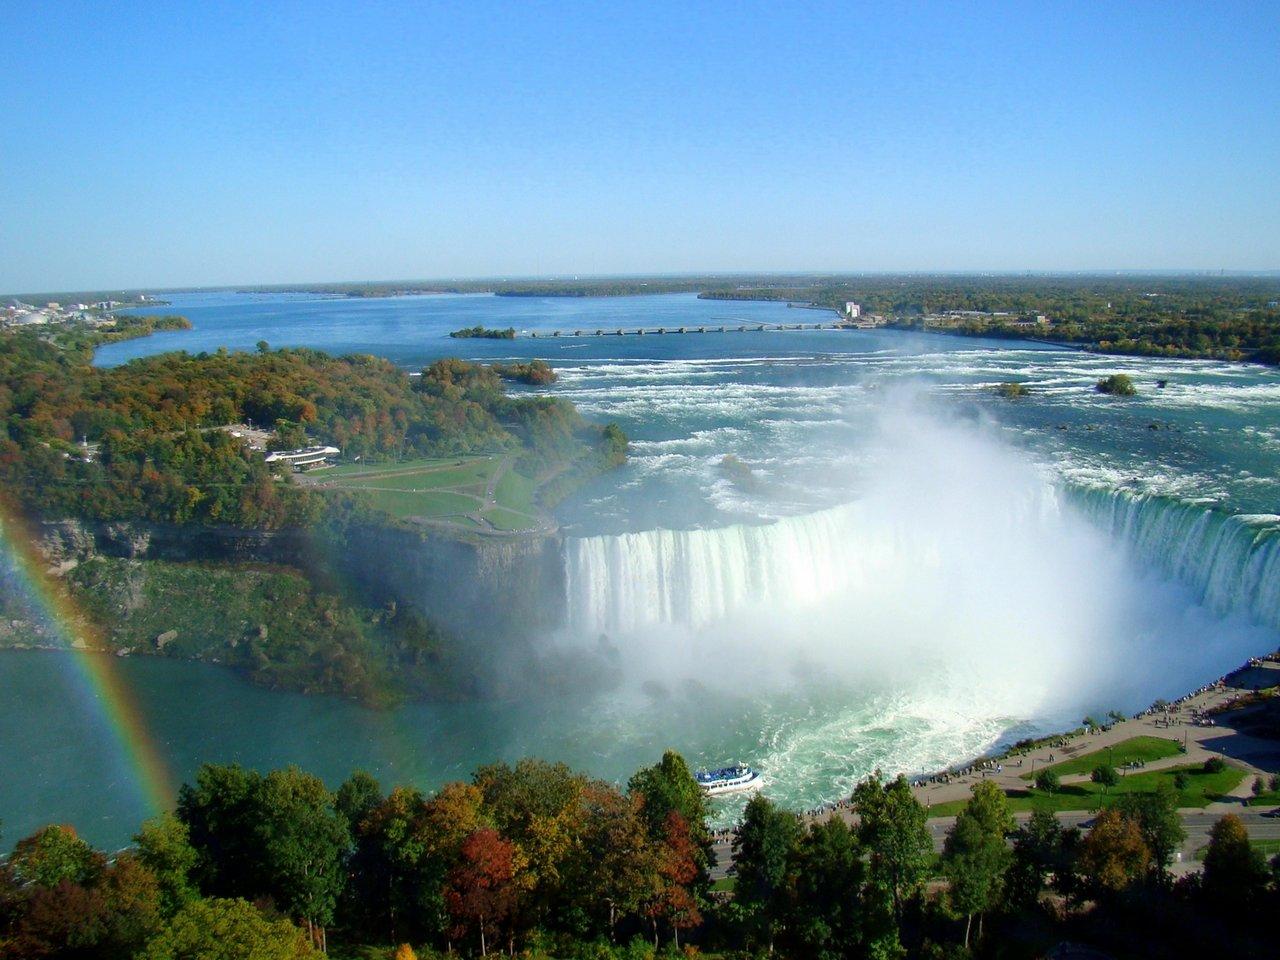 Niagara Falls Wallpapers Hd For Desktop Backgrounds